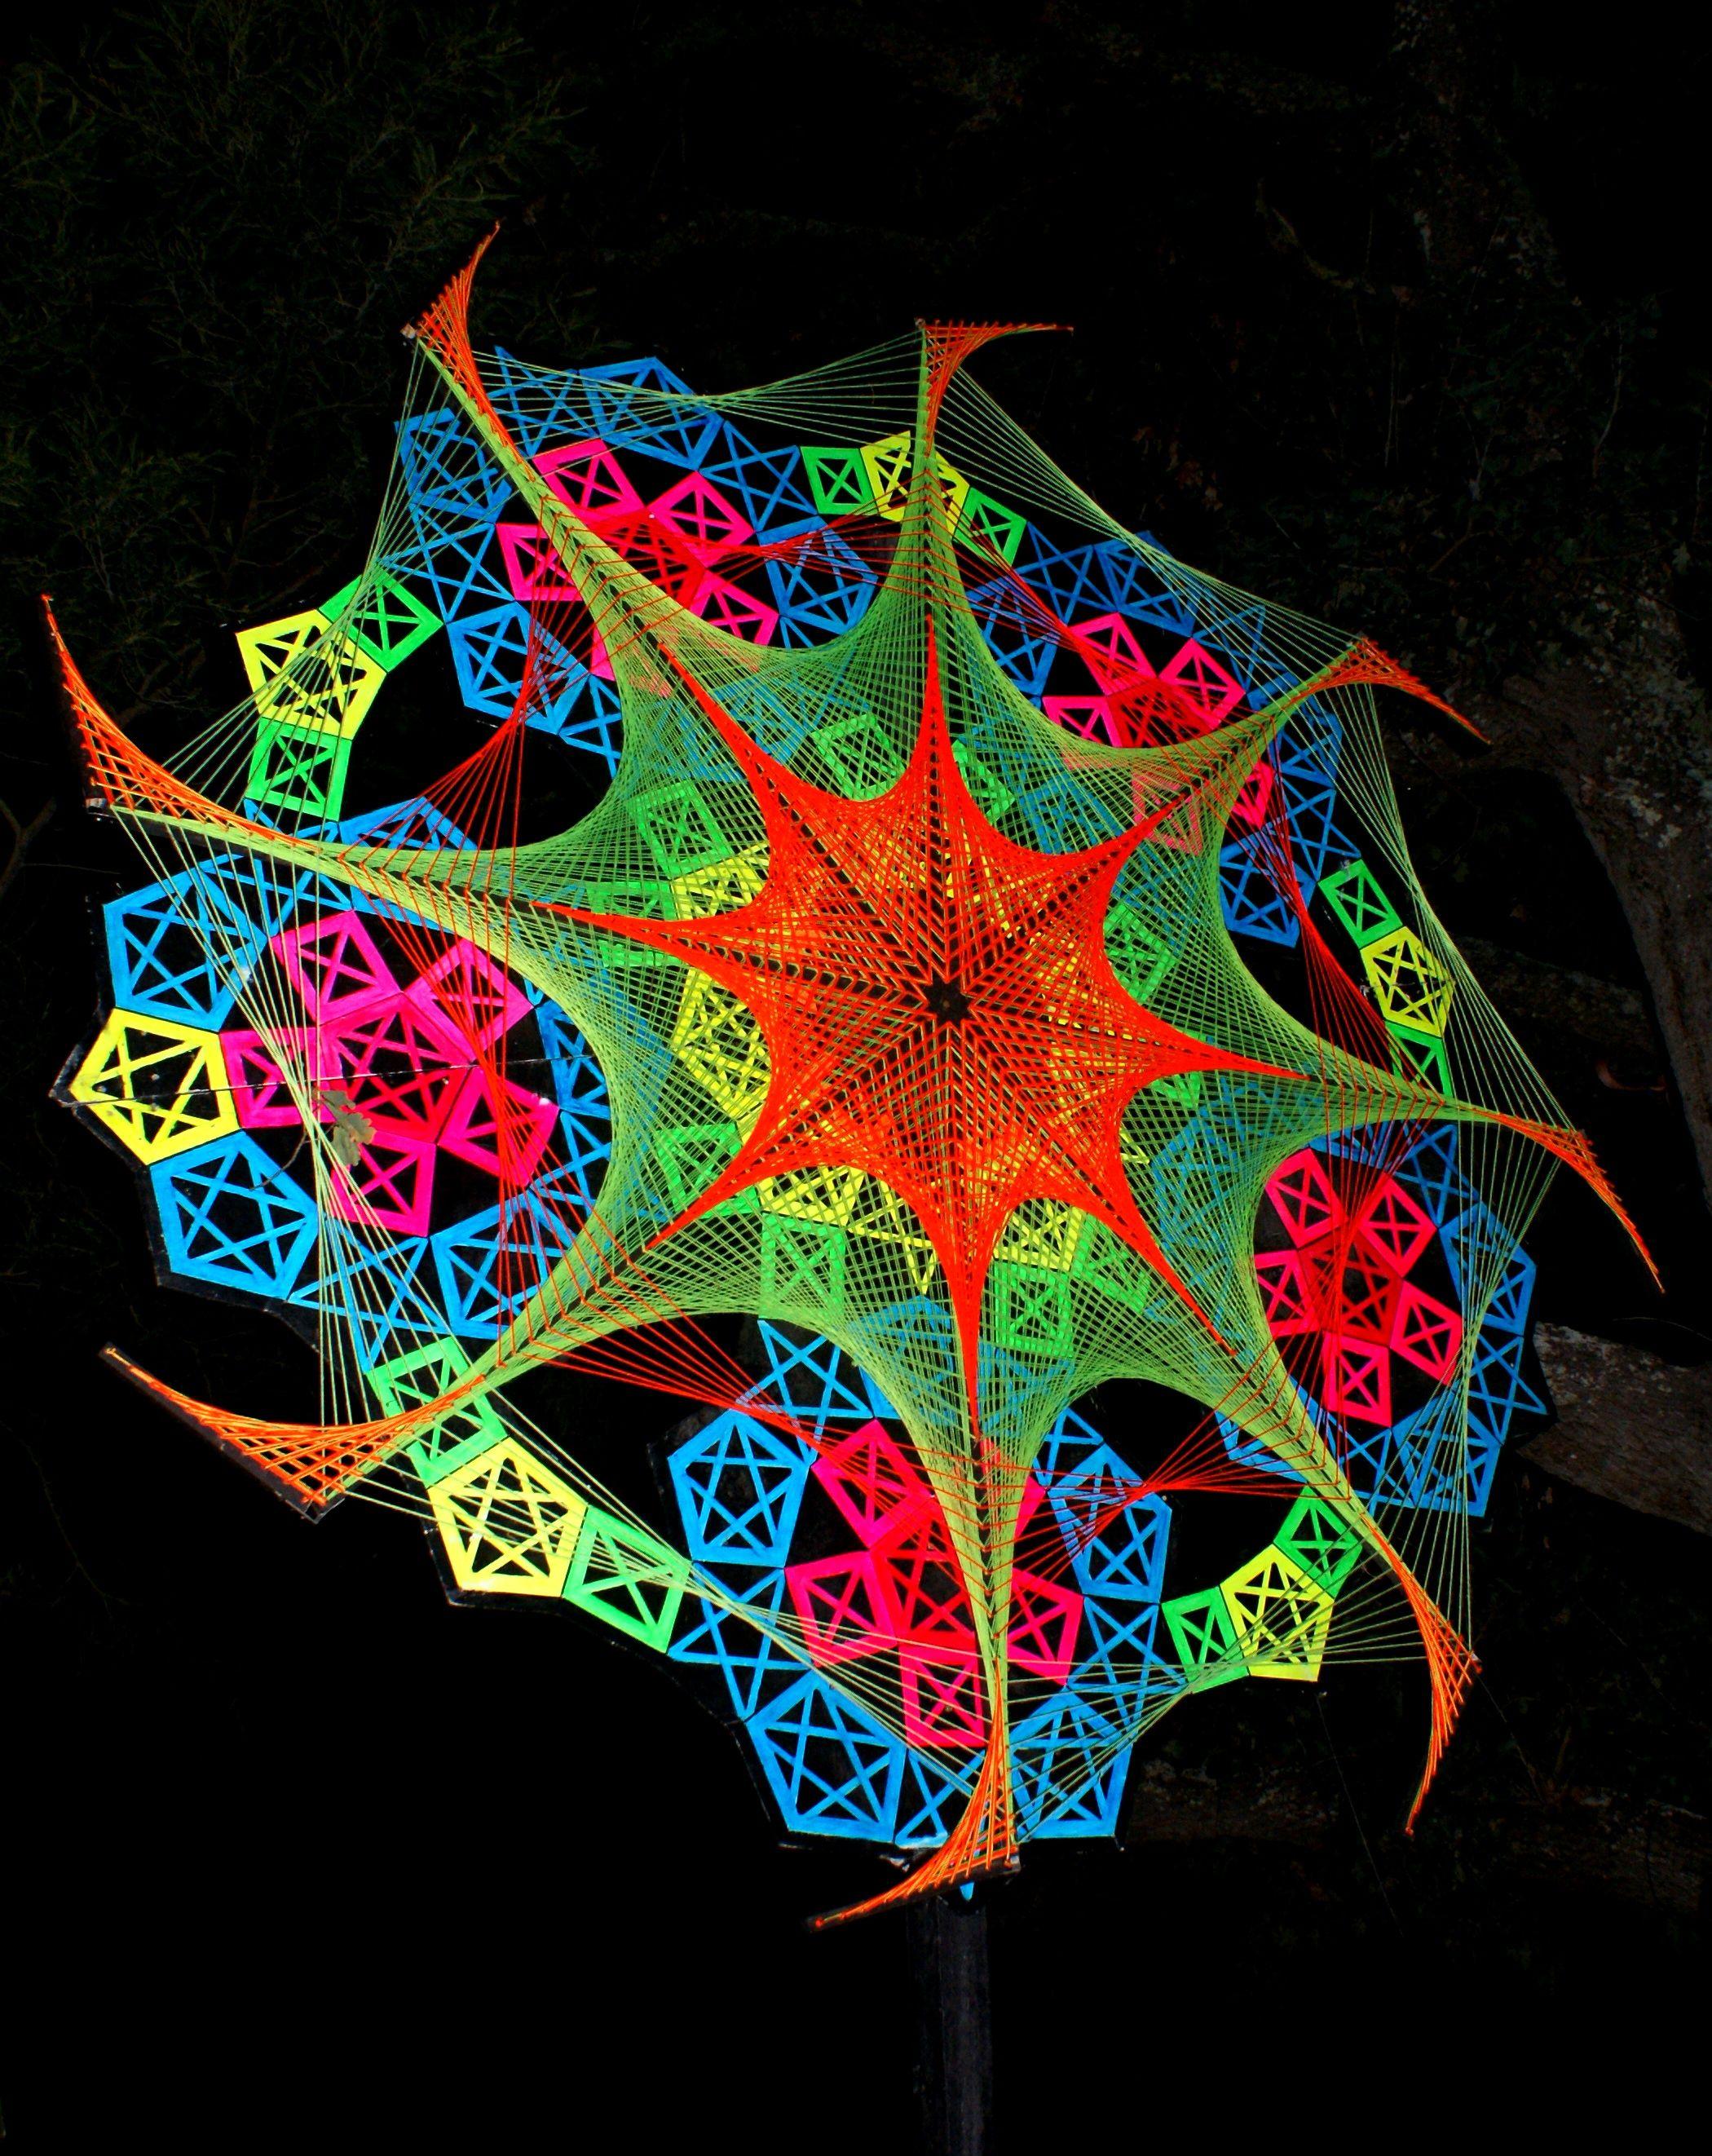 Festival Decor, String art, UV active, psychedelic decor, taken at ...